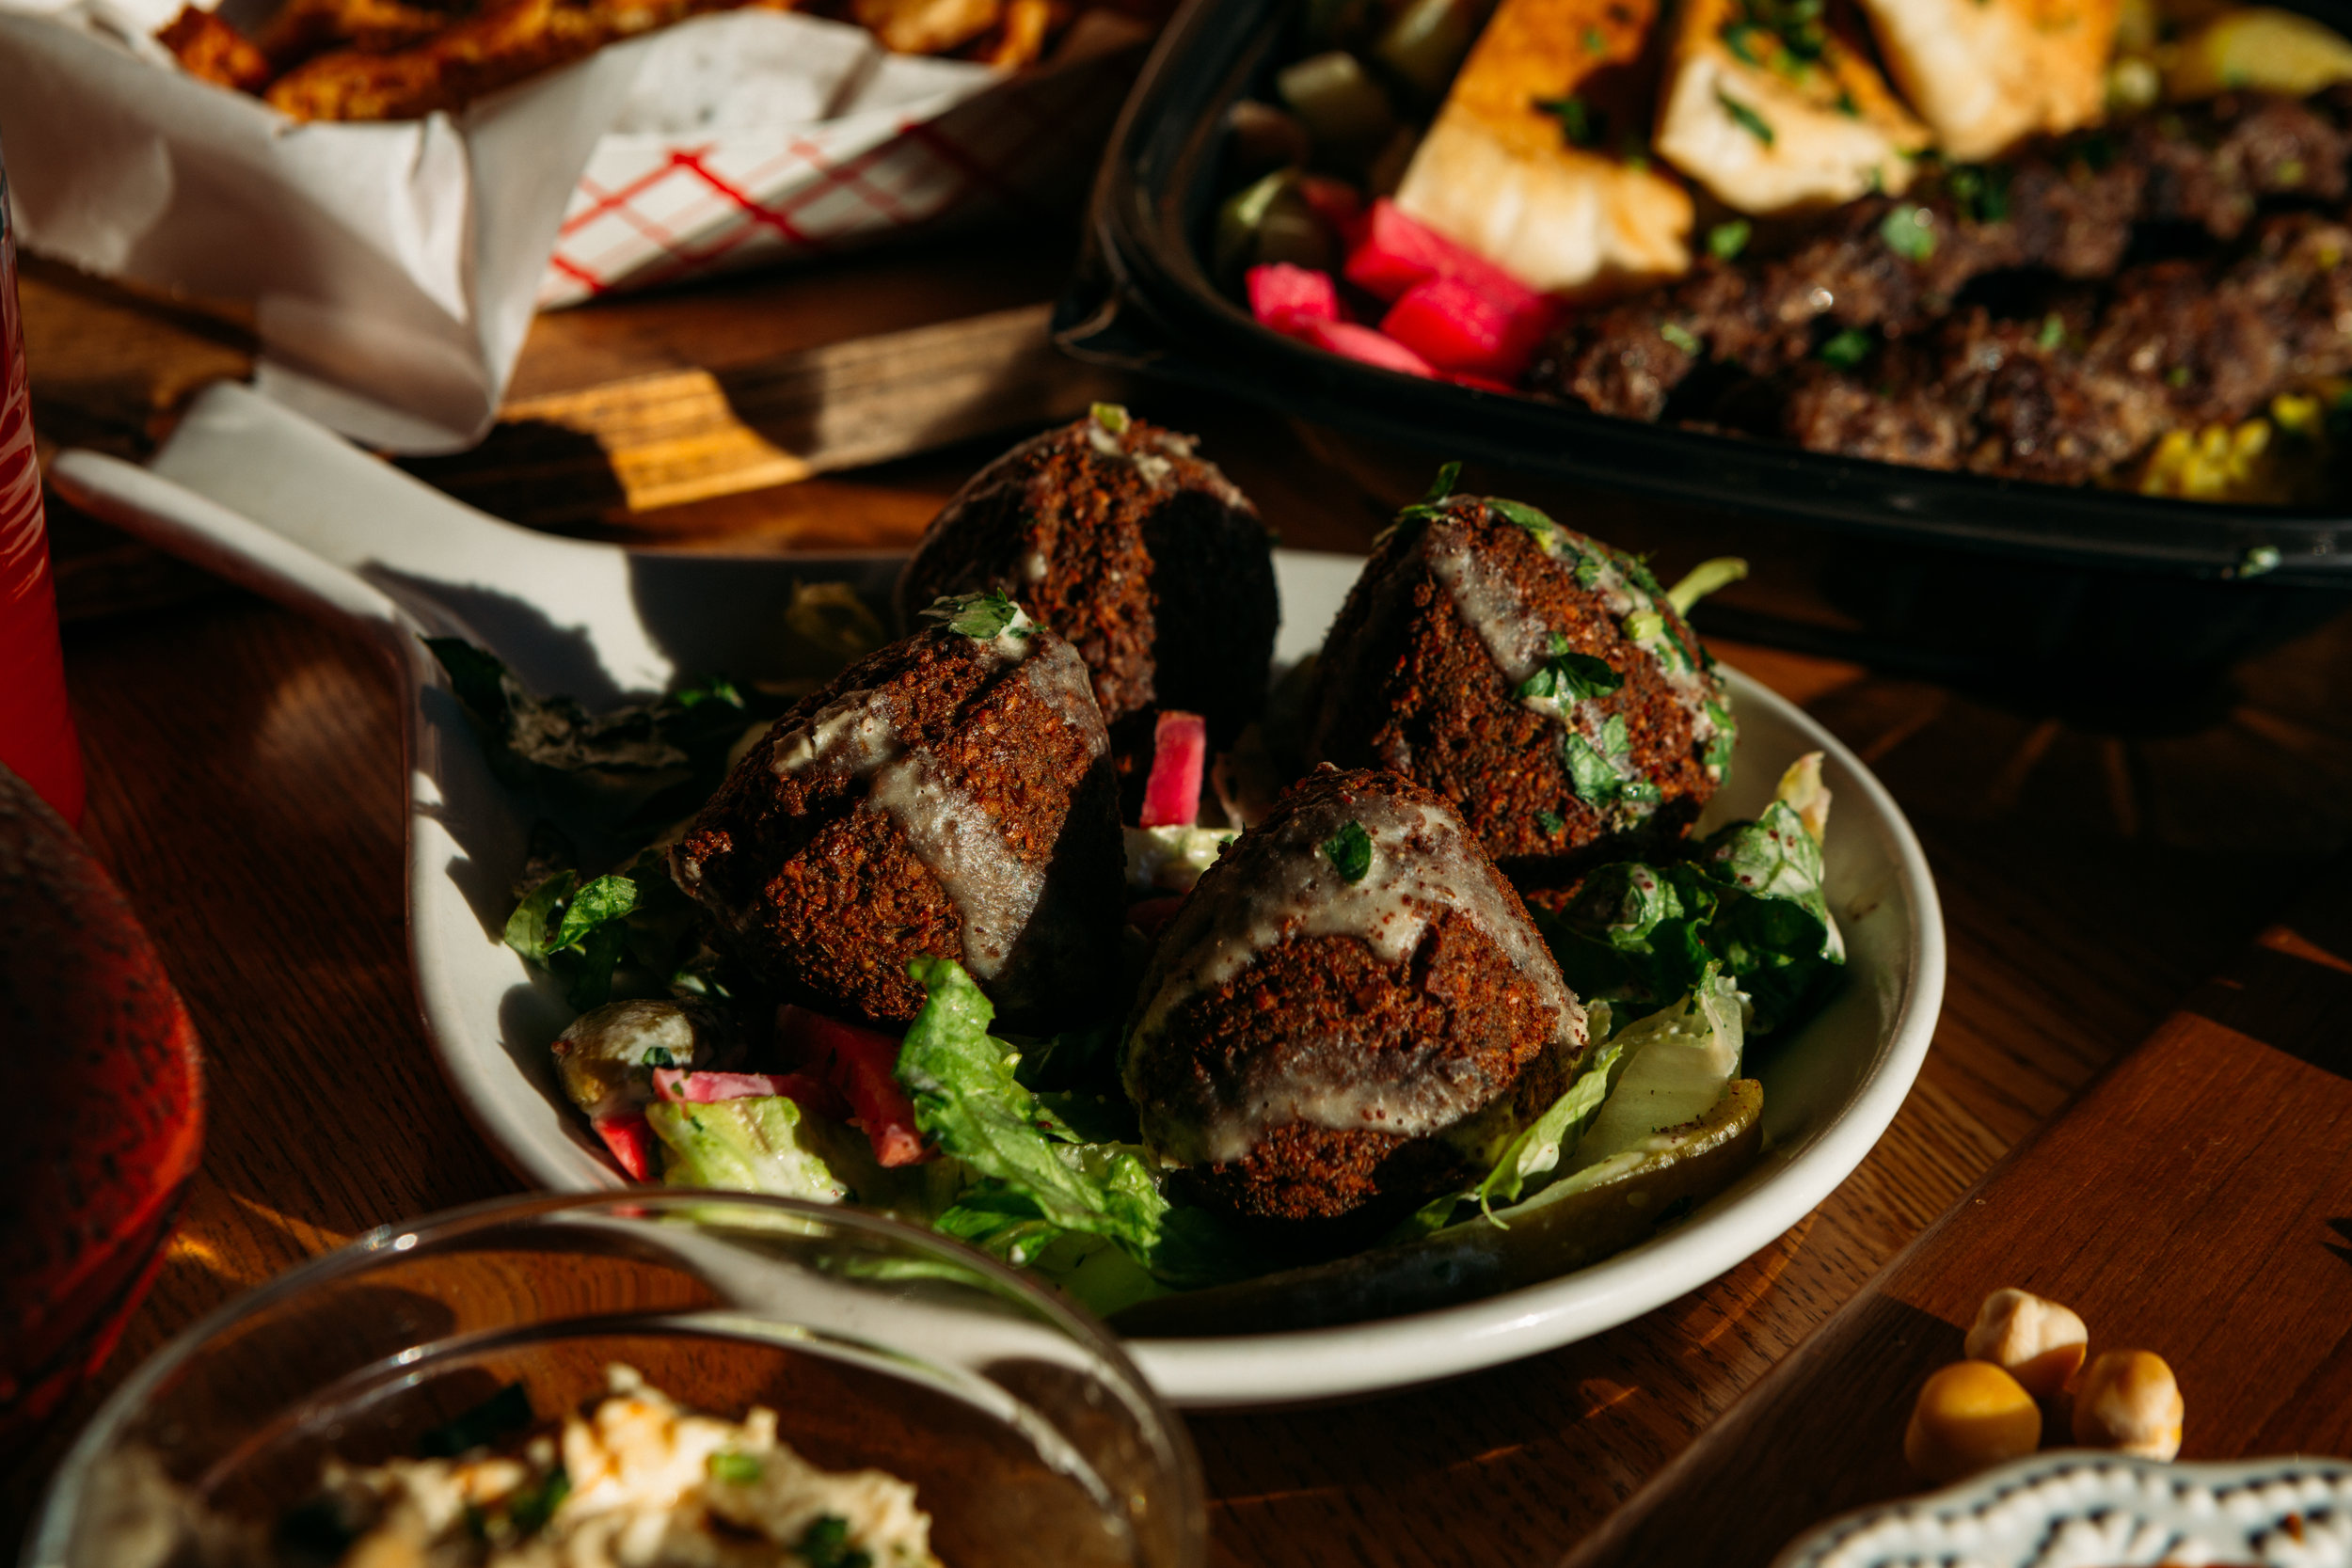 middleterranean-best-catering-addison-1.jpg